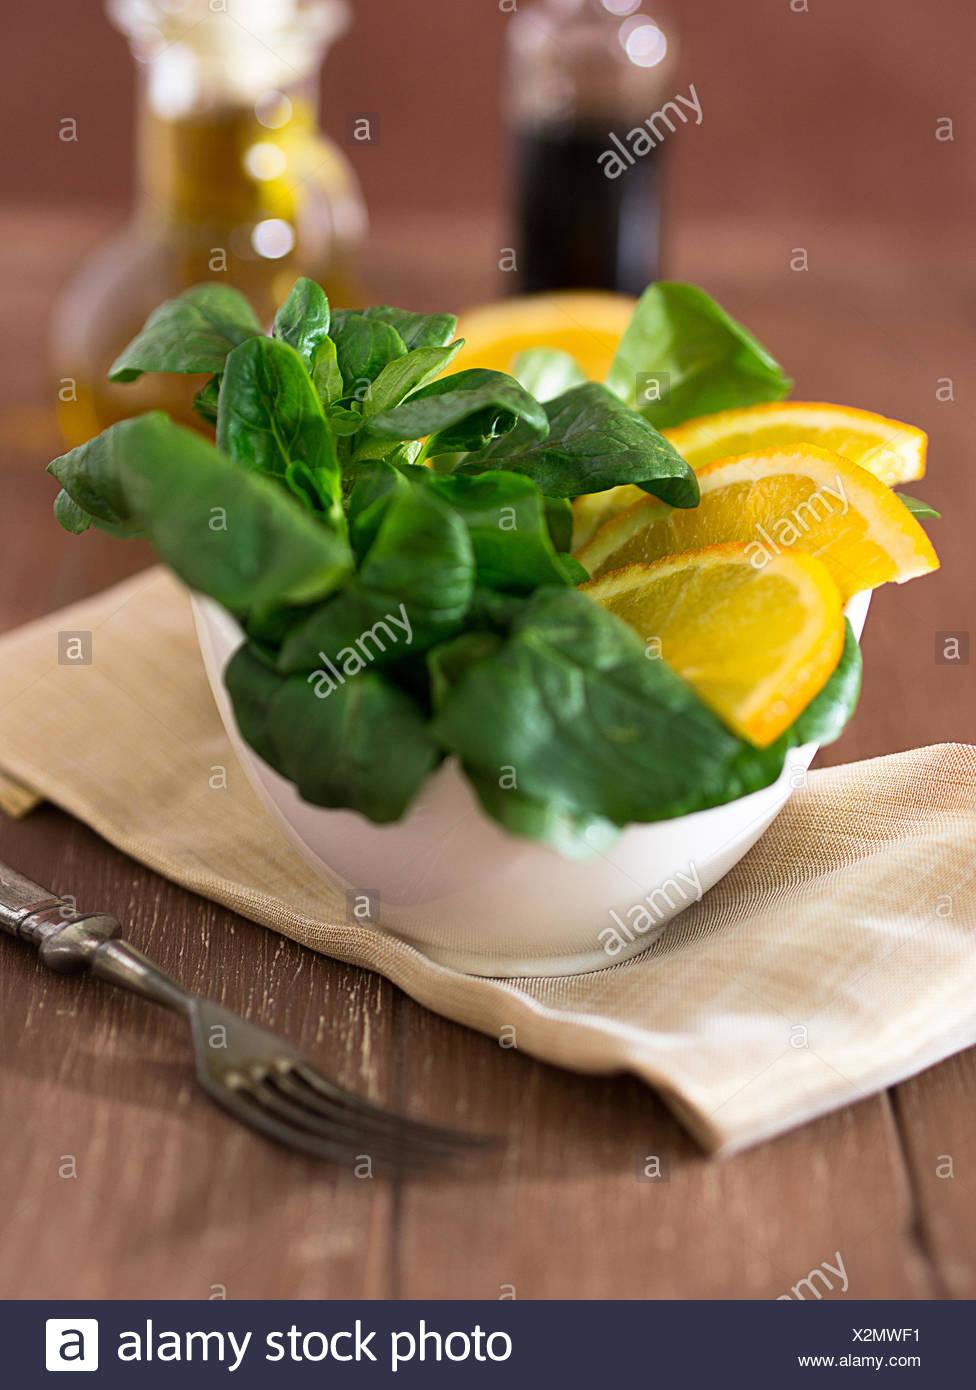 Lamb's lettuce with oranges Stock Photo